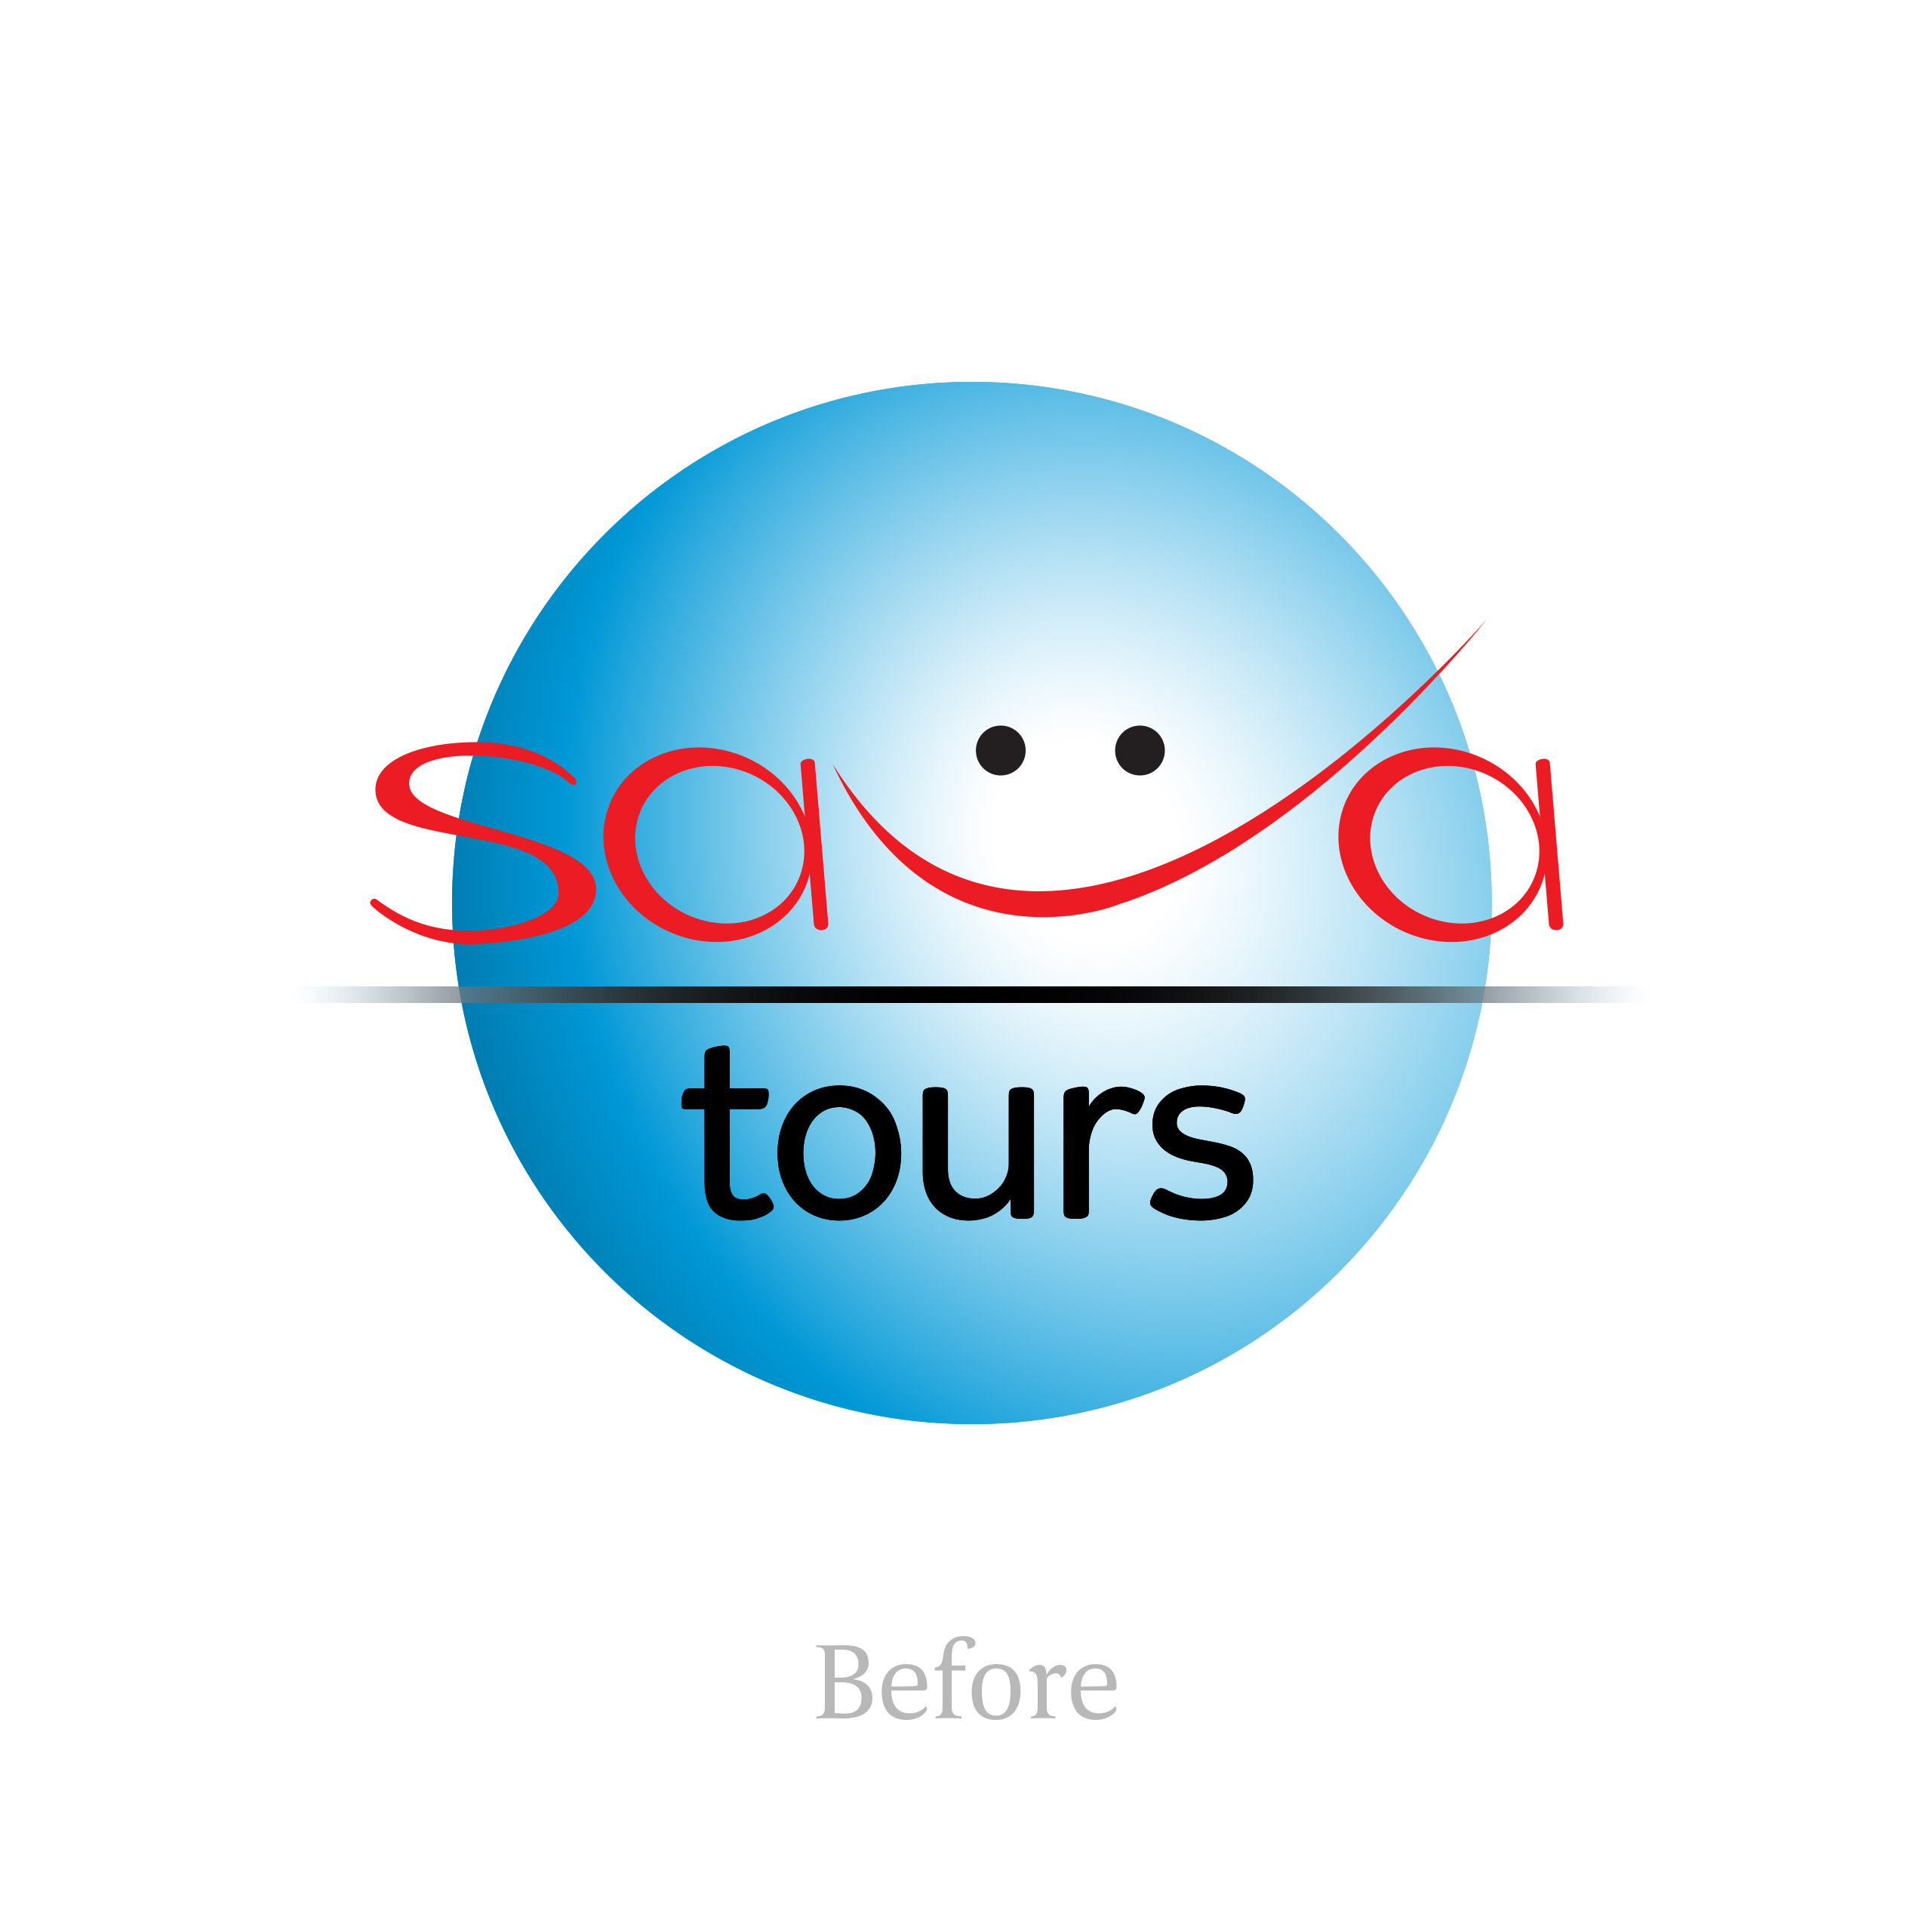 Sava Tours Project Img 13 - Vatra Agency / Founder & CEO Gerton Bejo